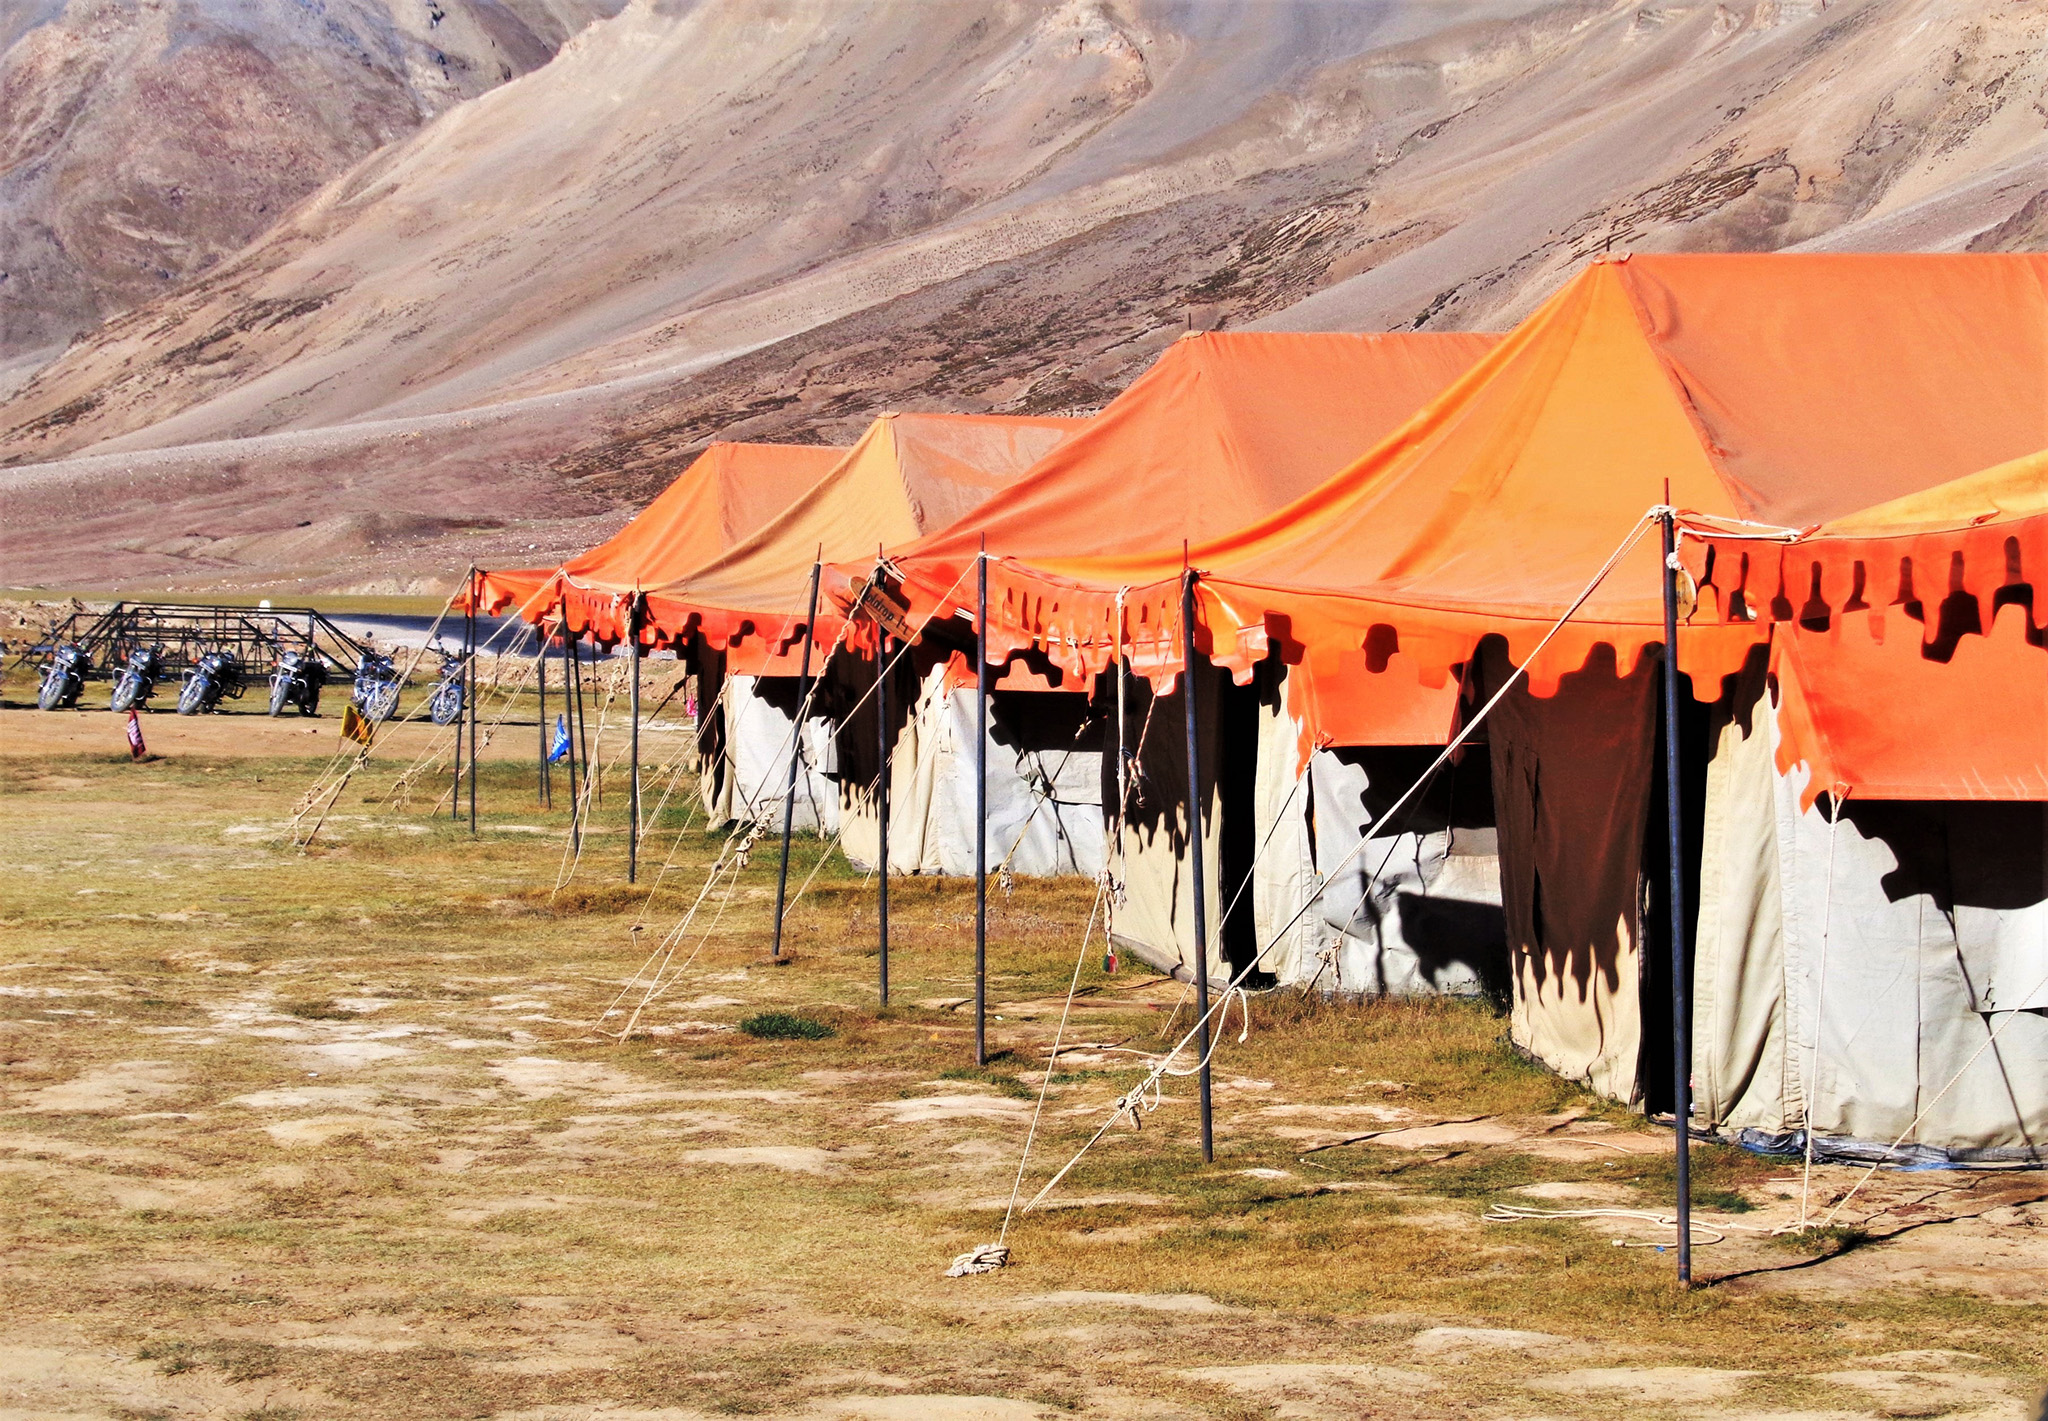 Tentes dans l'Himalaya